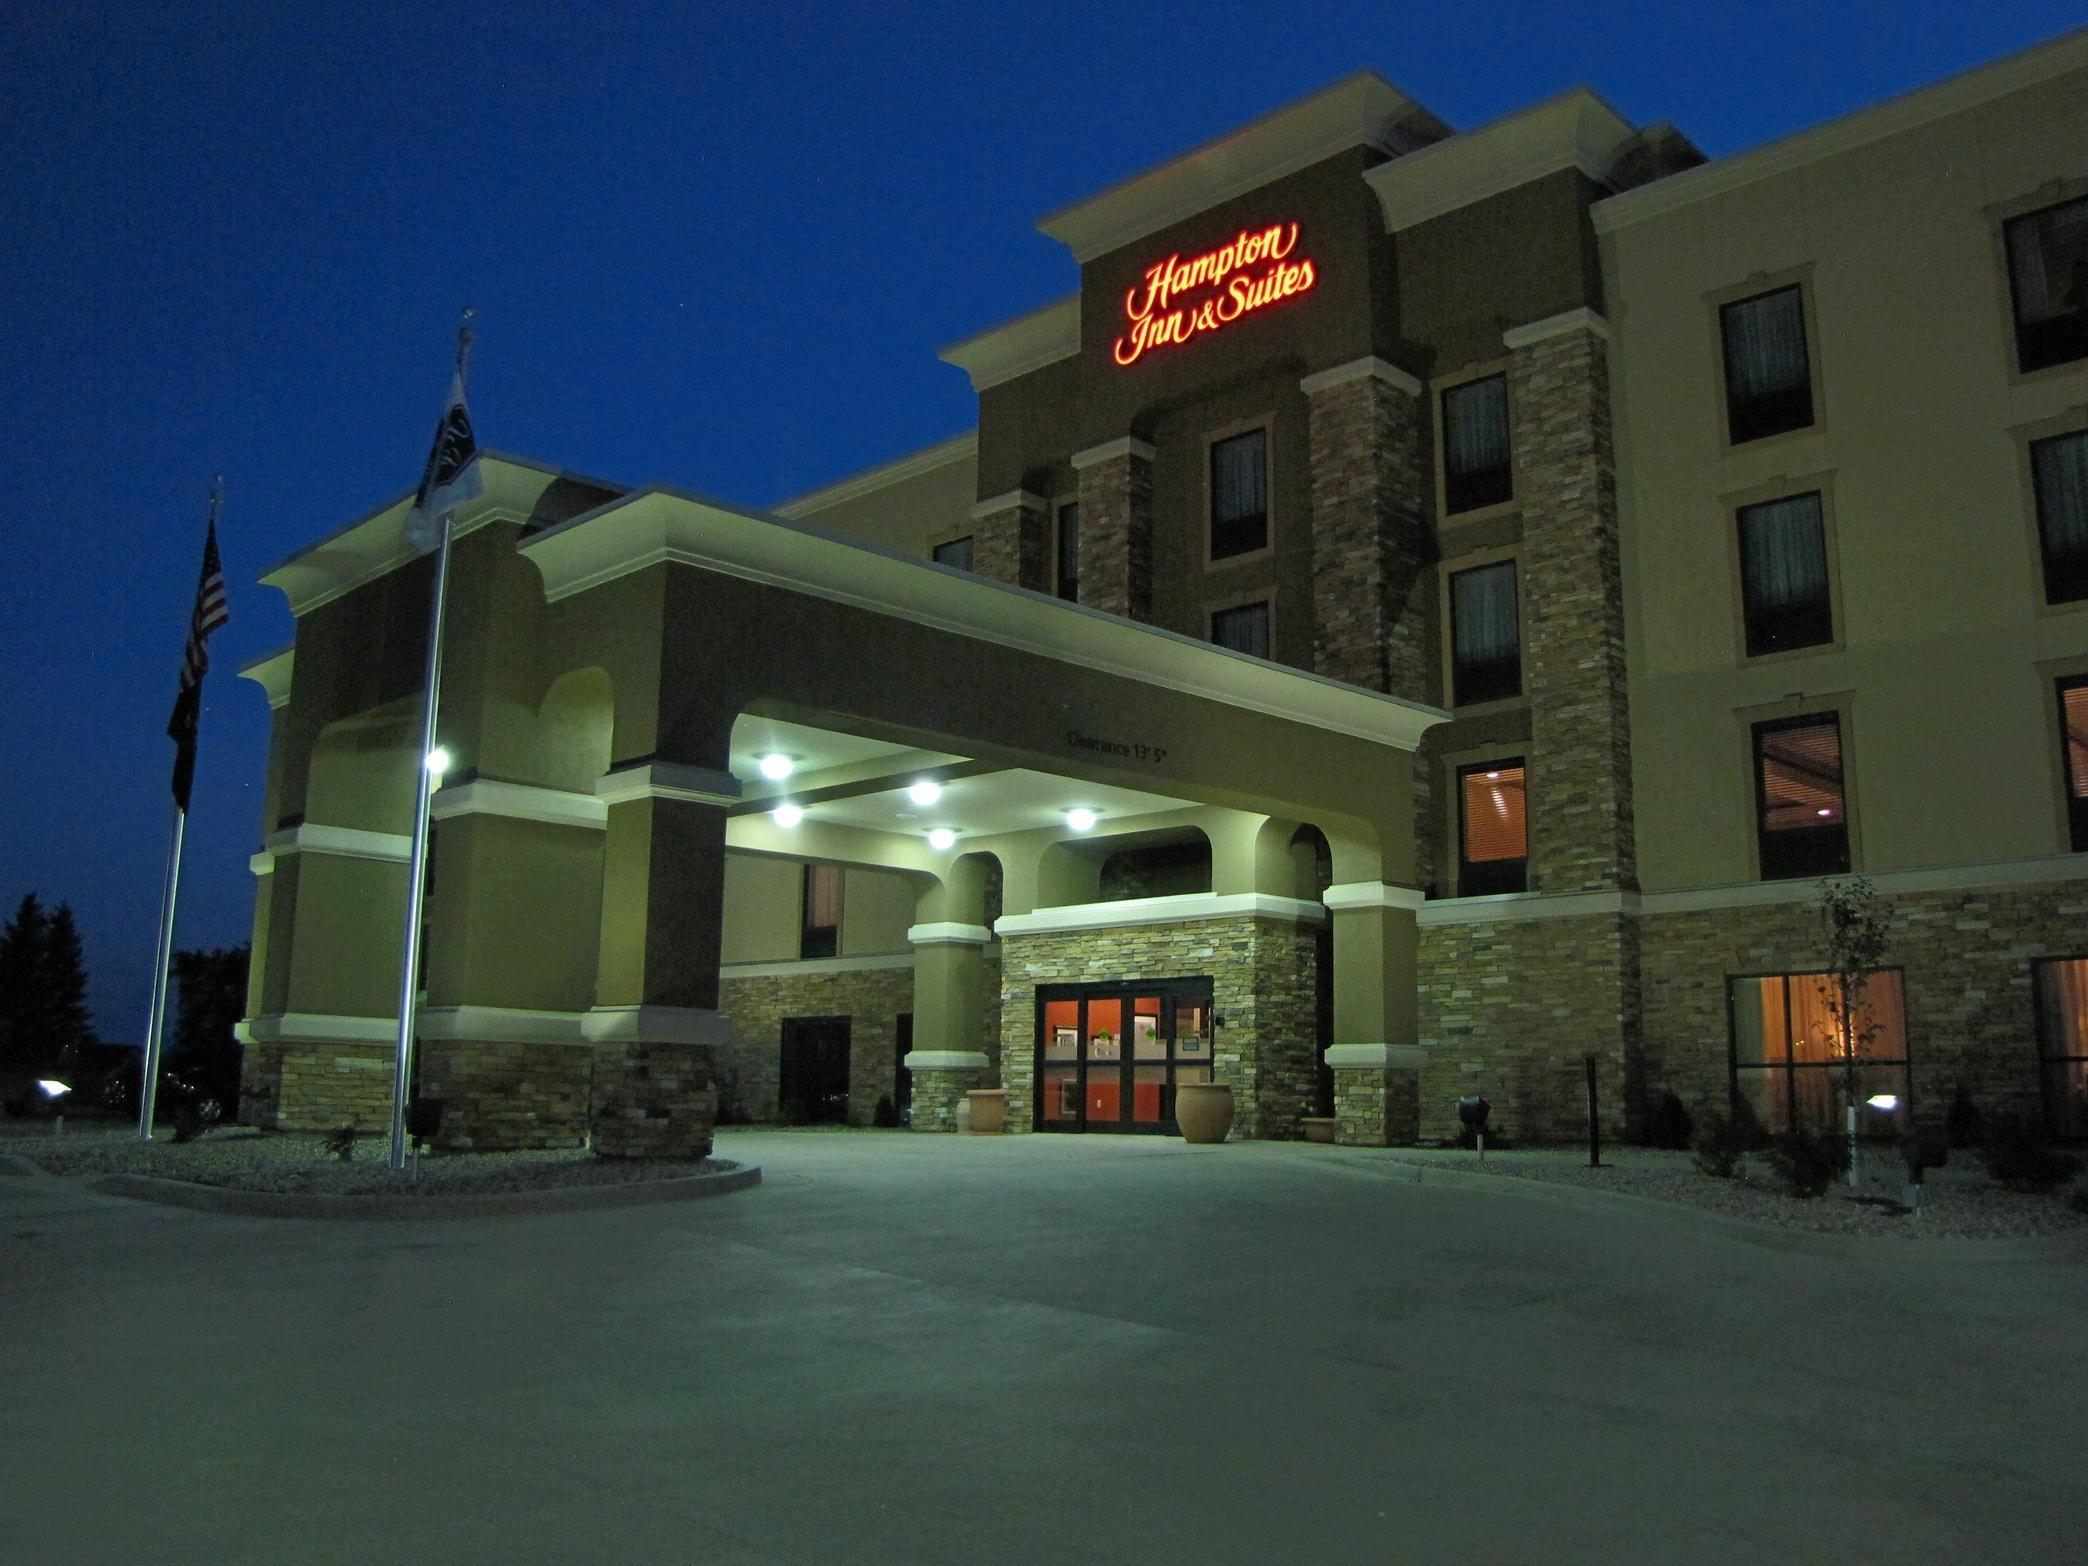 Hampton Inn & Suites Jamestown, ND image 0